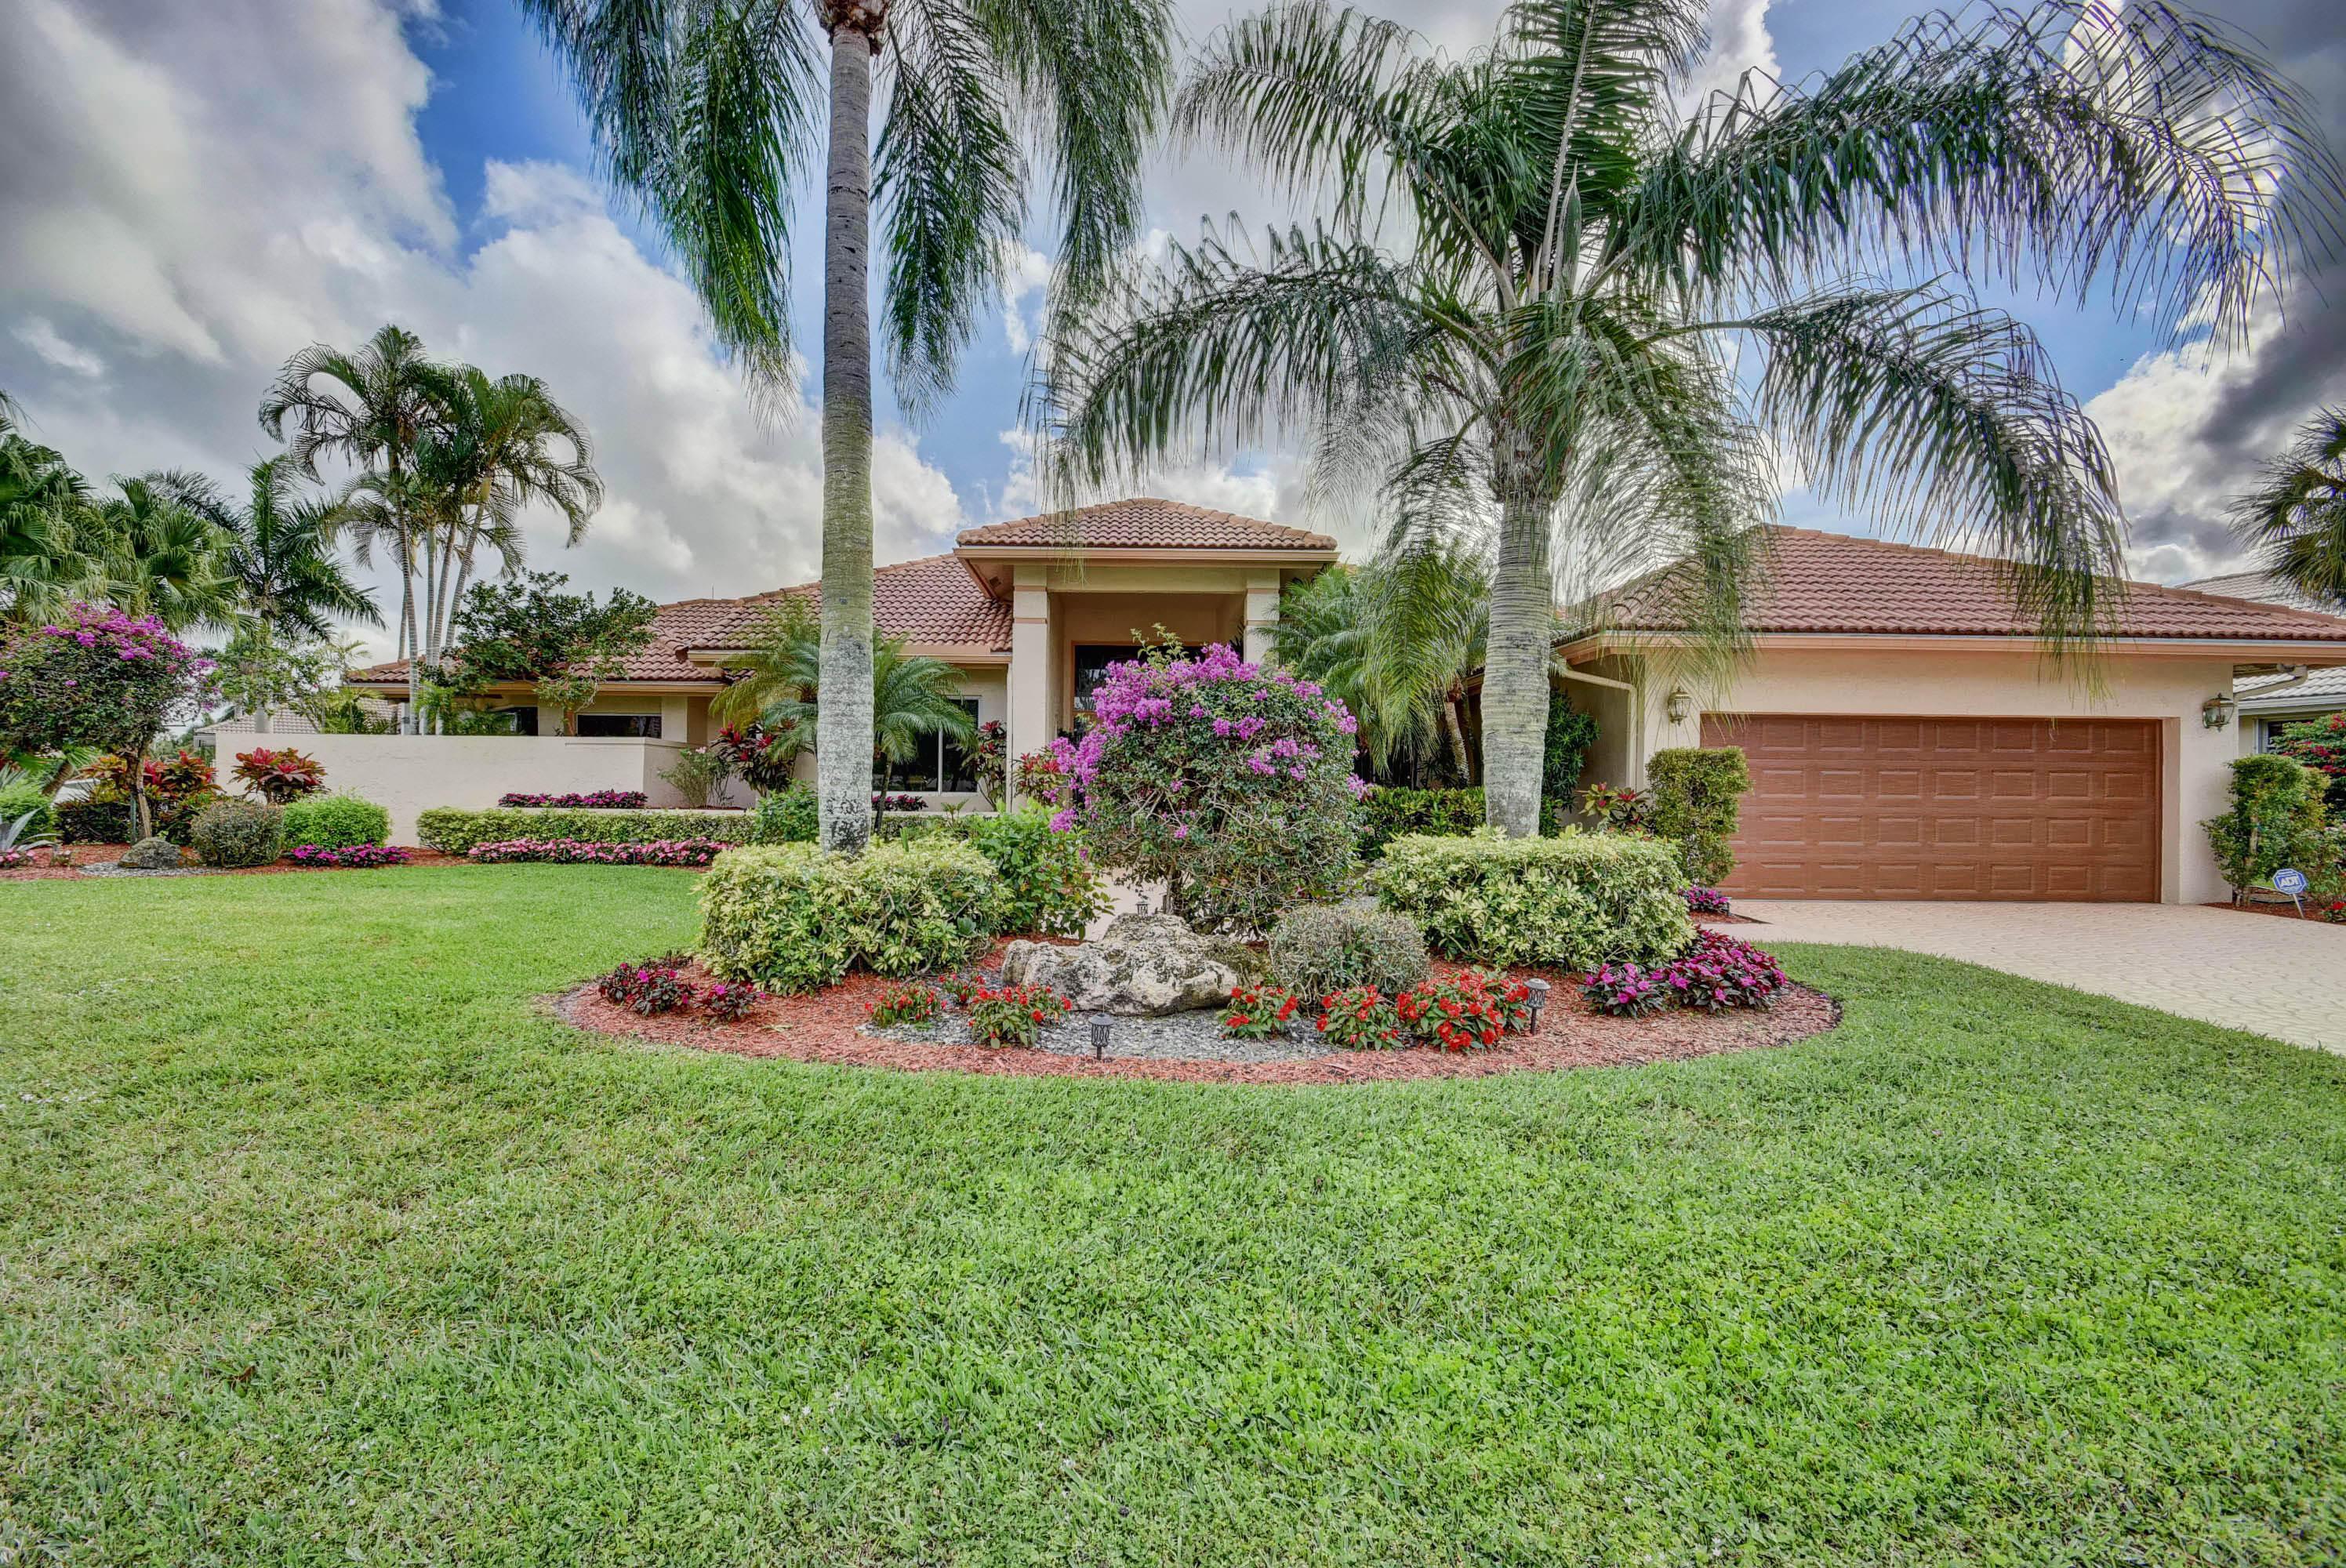 INDIAN SPRING 5 home 11207 Westland Circle Boynton Beach FL 33437